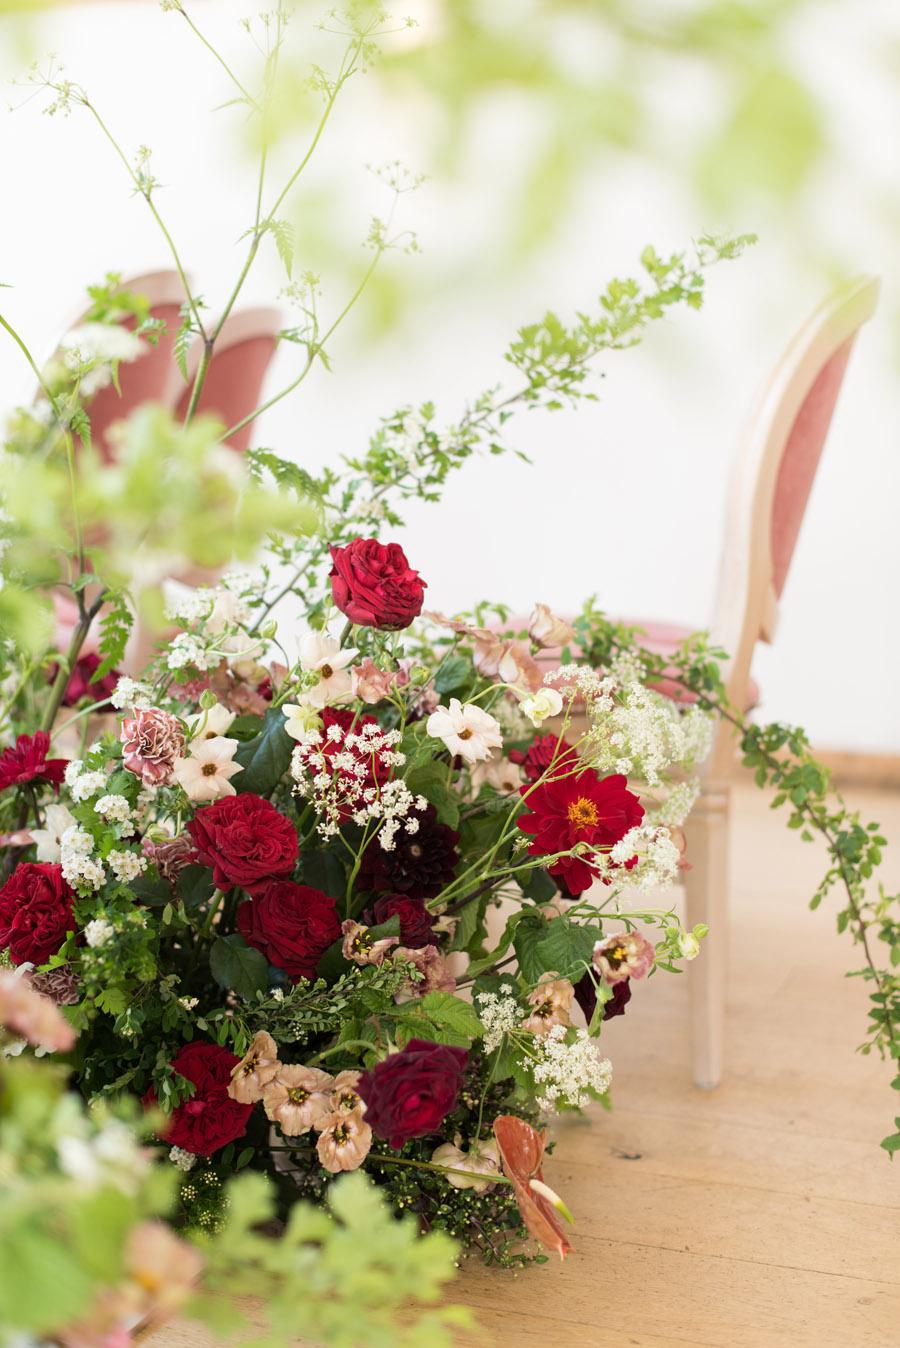 floral wedding ideas at Millbridge Court on English Wedding - photo credit Julie Michaelsen Photography (13)